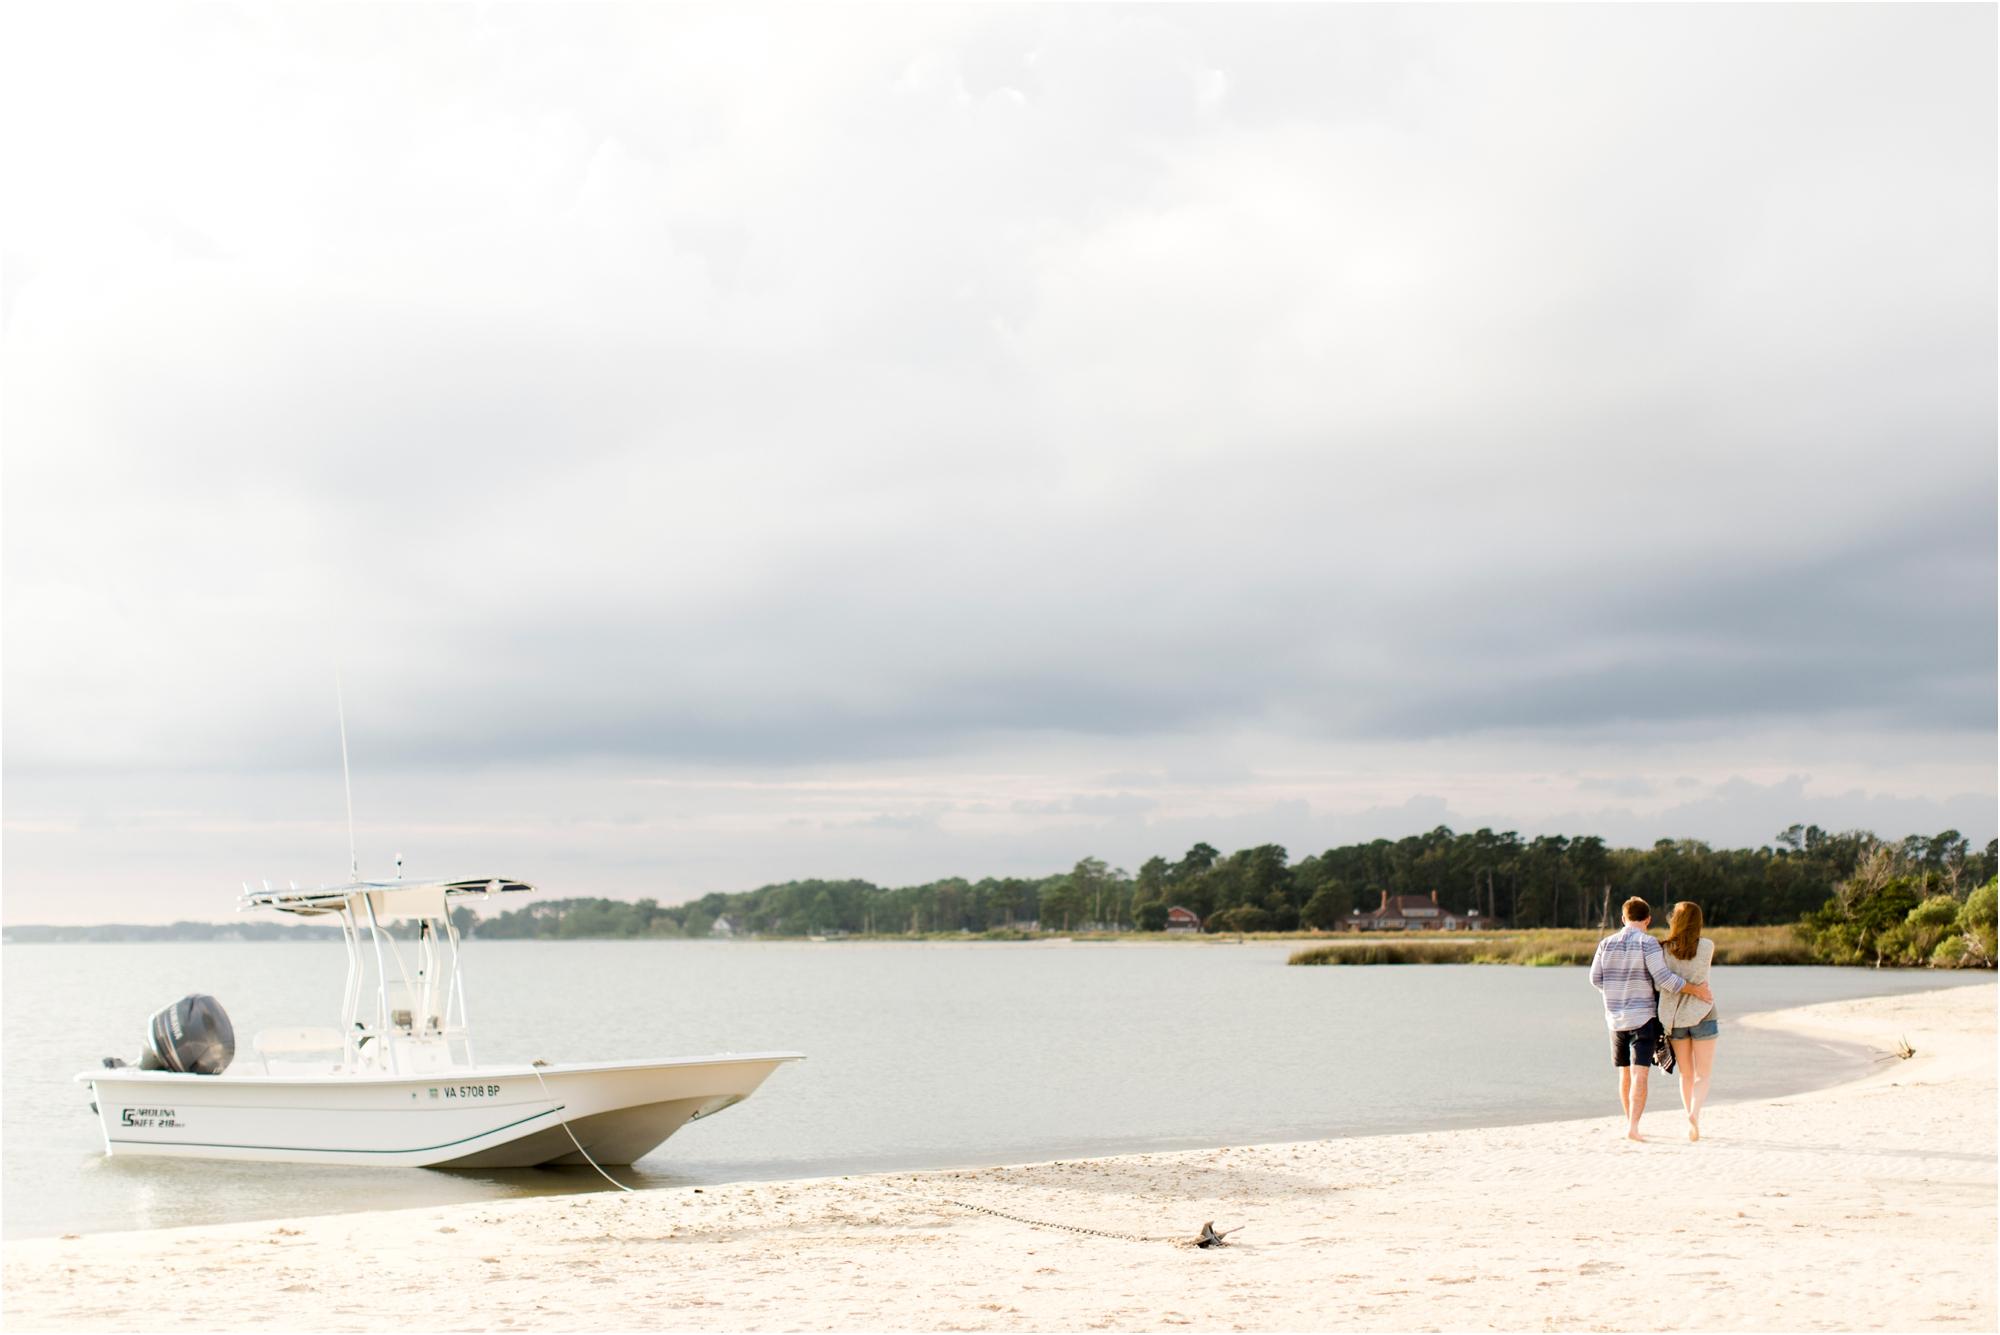 emily-drew-chesapeake-bay-beach-virginia-engagement-photos_0007.jpg